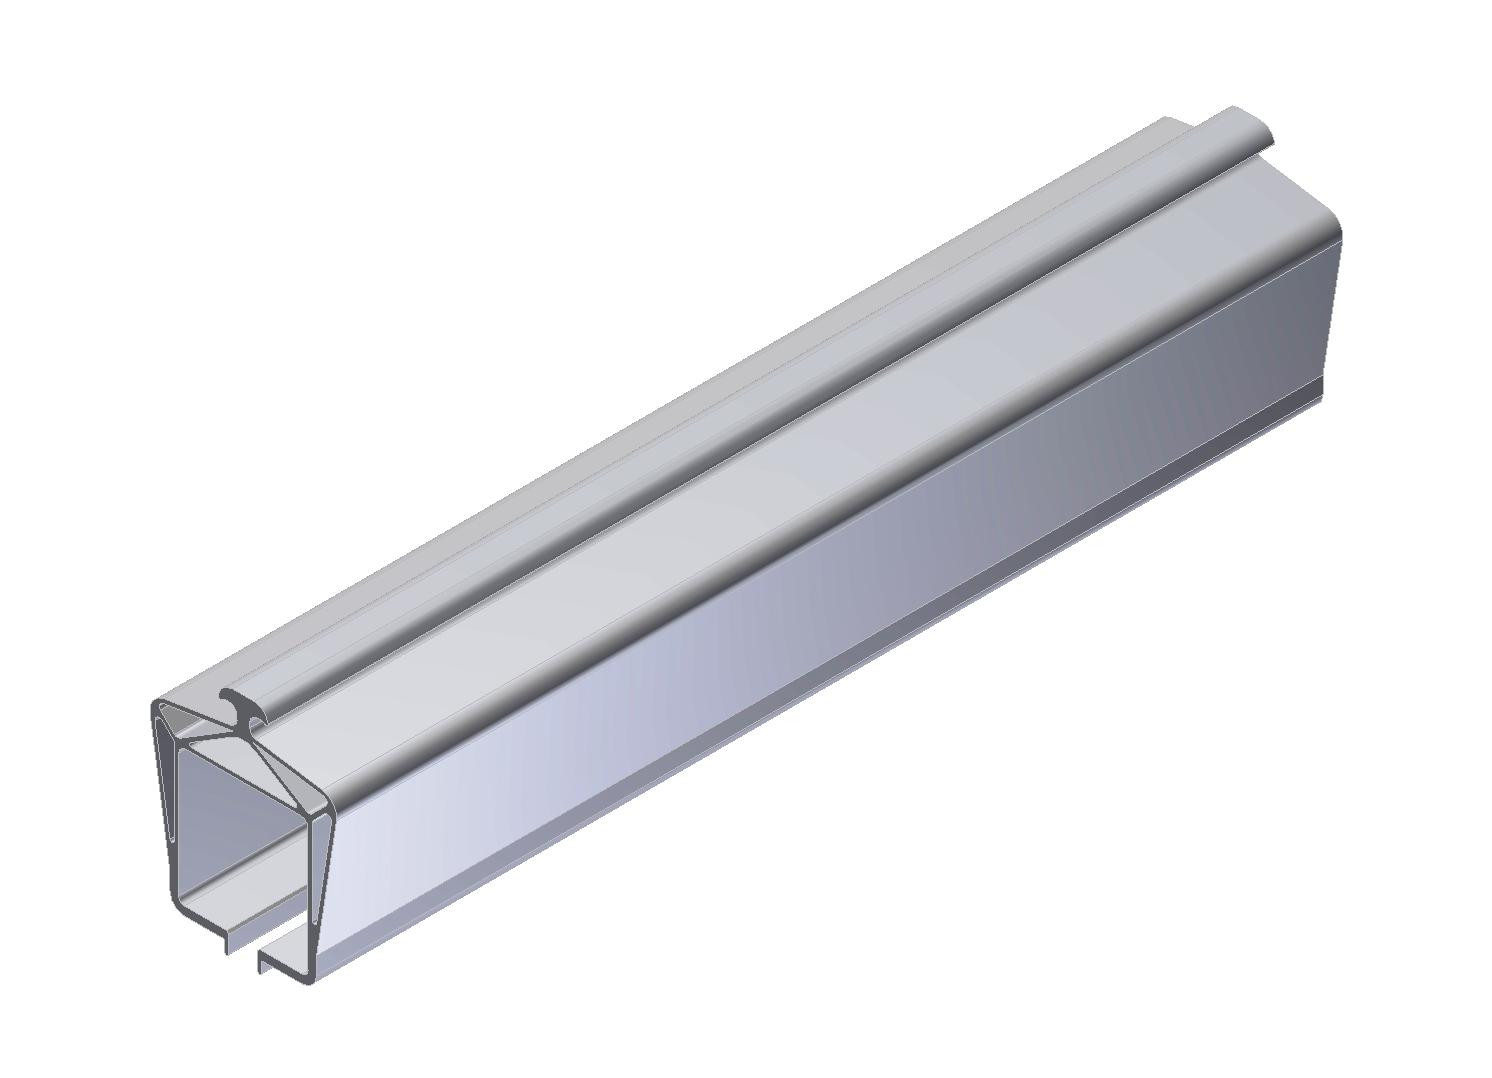 Aluminum overhead rail